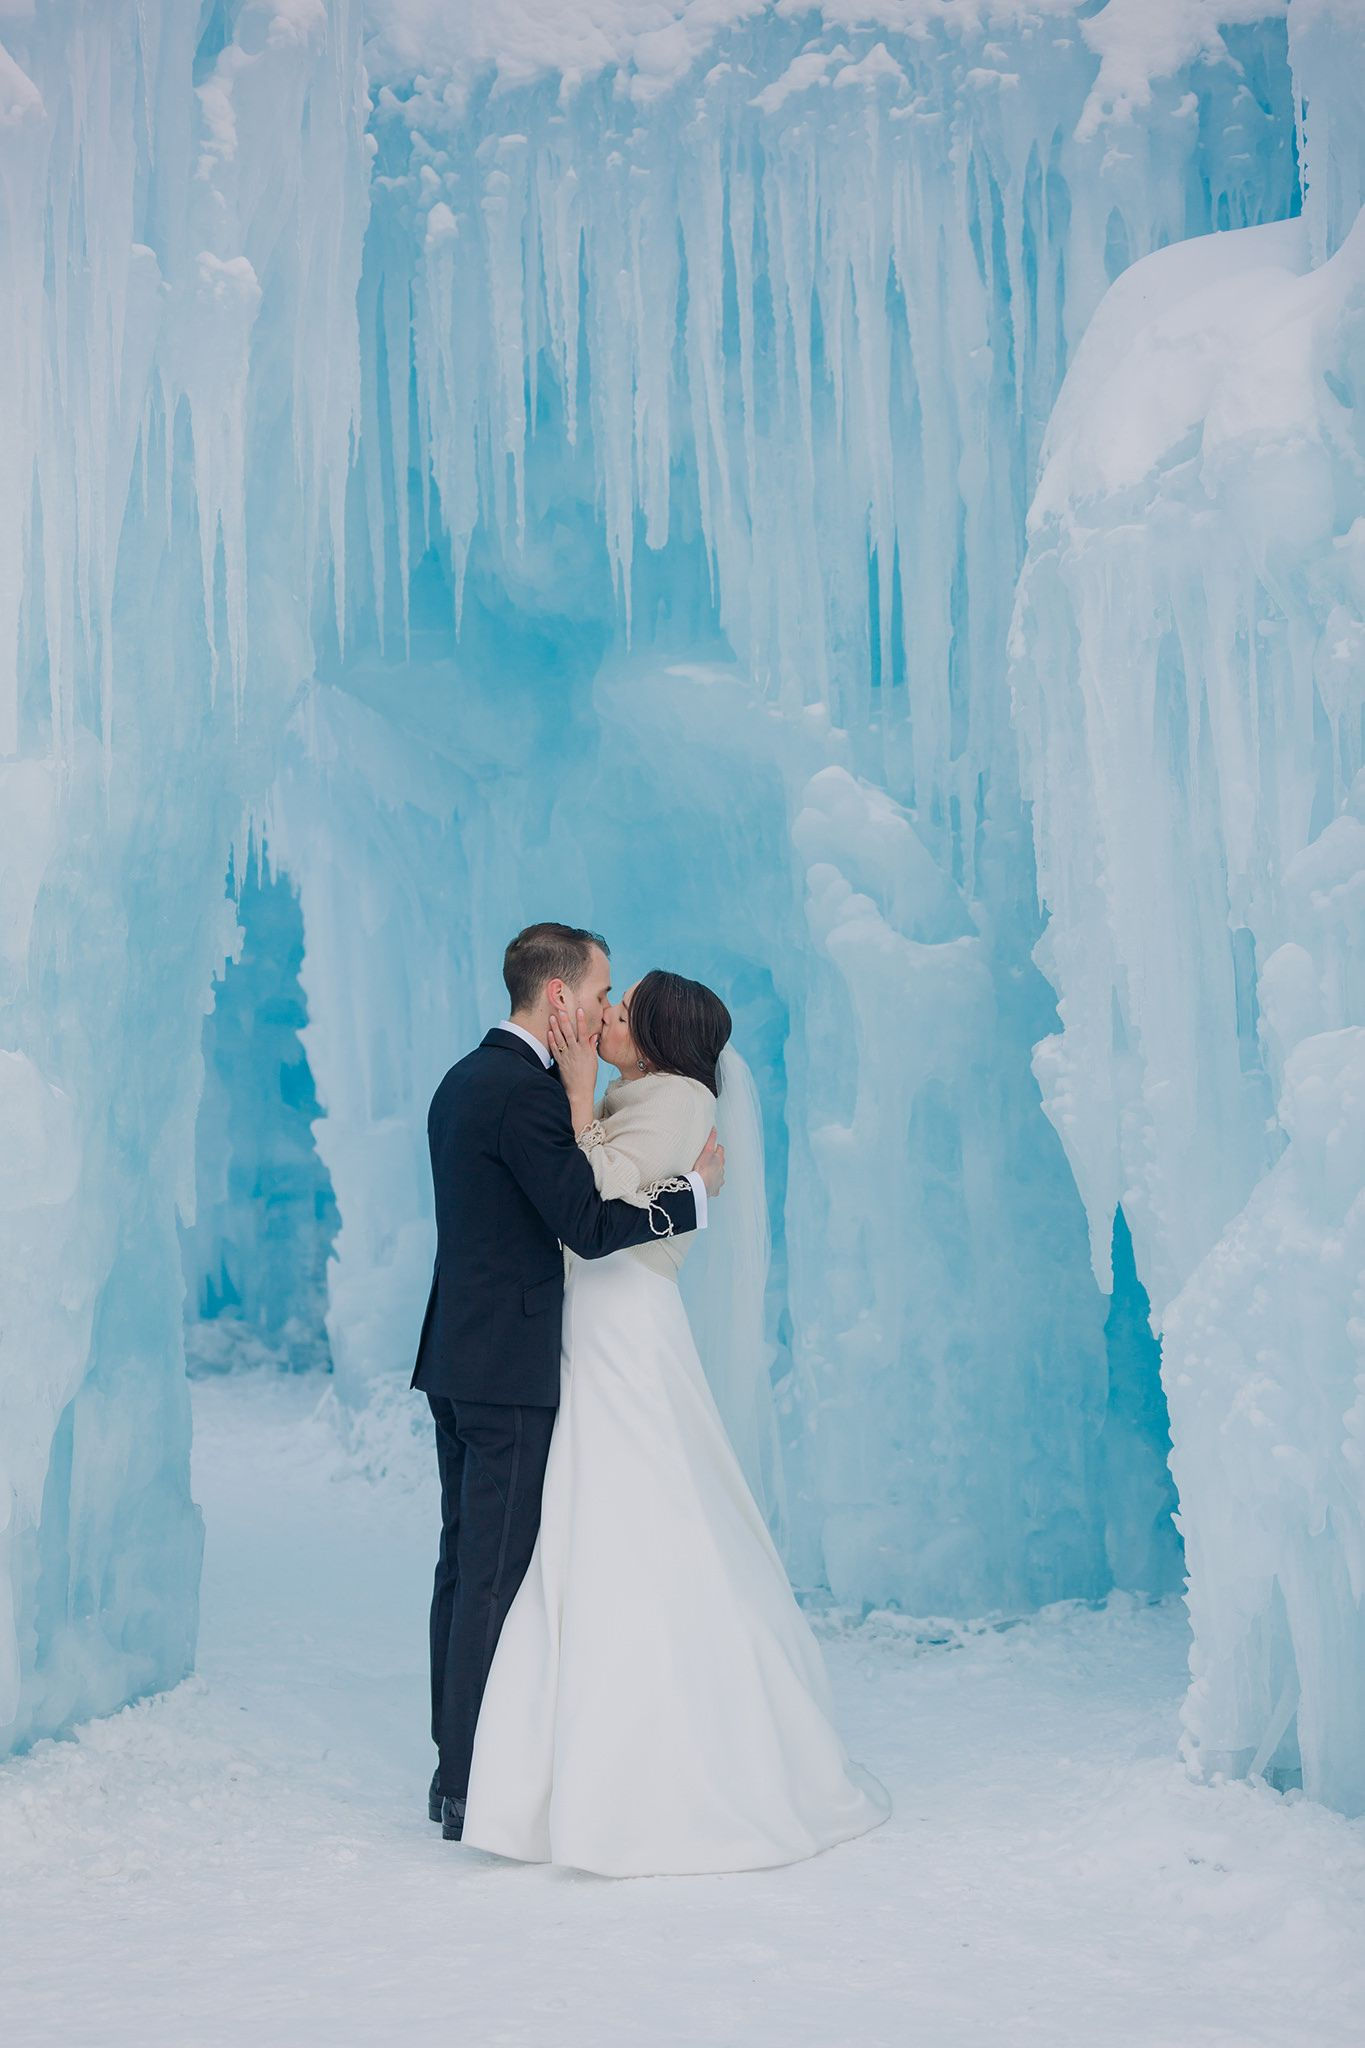 Frozen wedding portraits. Bride & Groom in Edmonton IceCastles. Ice Castle  wedding photos in… | Winter wedding locations, Winter wedding, Winter  wedding inspiration